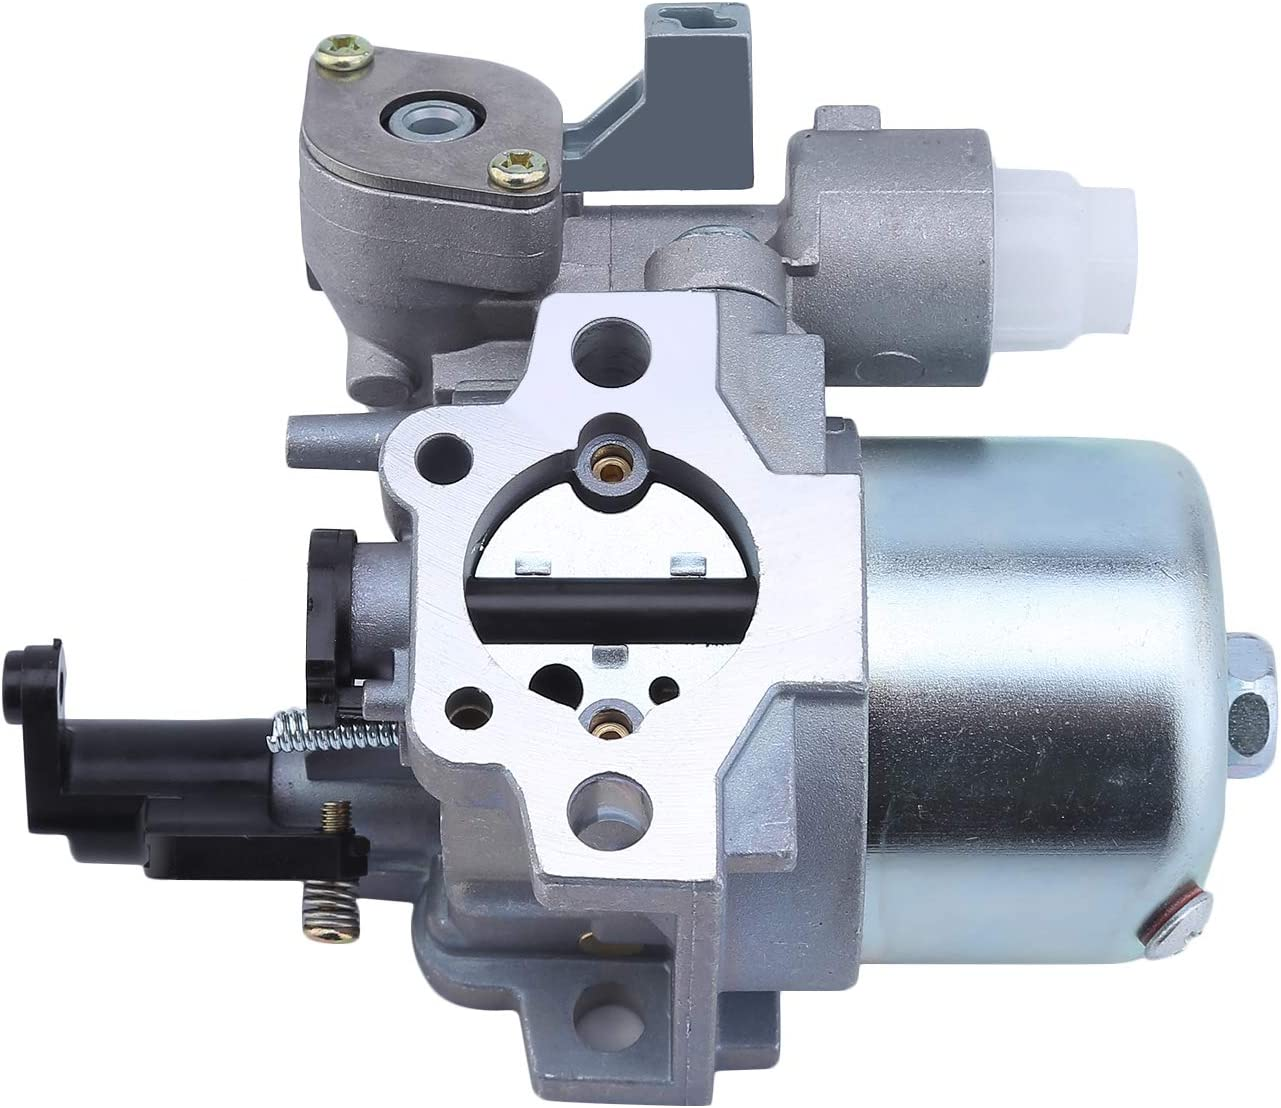 FayOK Durable Carburetor for Robin for Subaru Ex21 Professional Overhead Cam Engine Carburetor 278-62301-50 278-62301-60